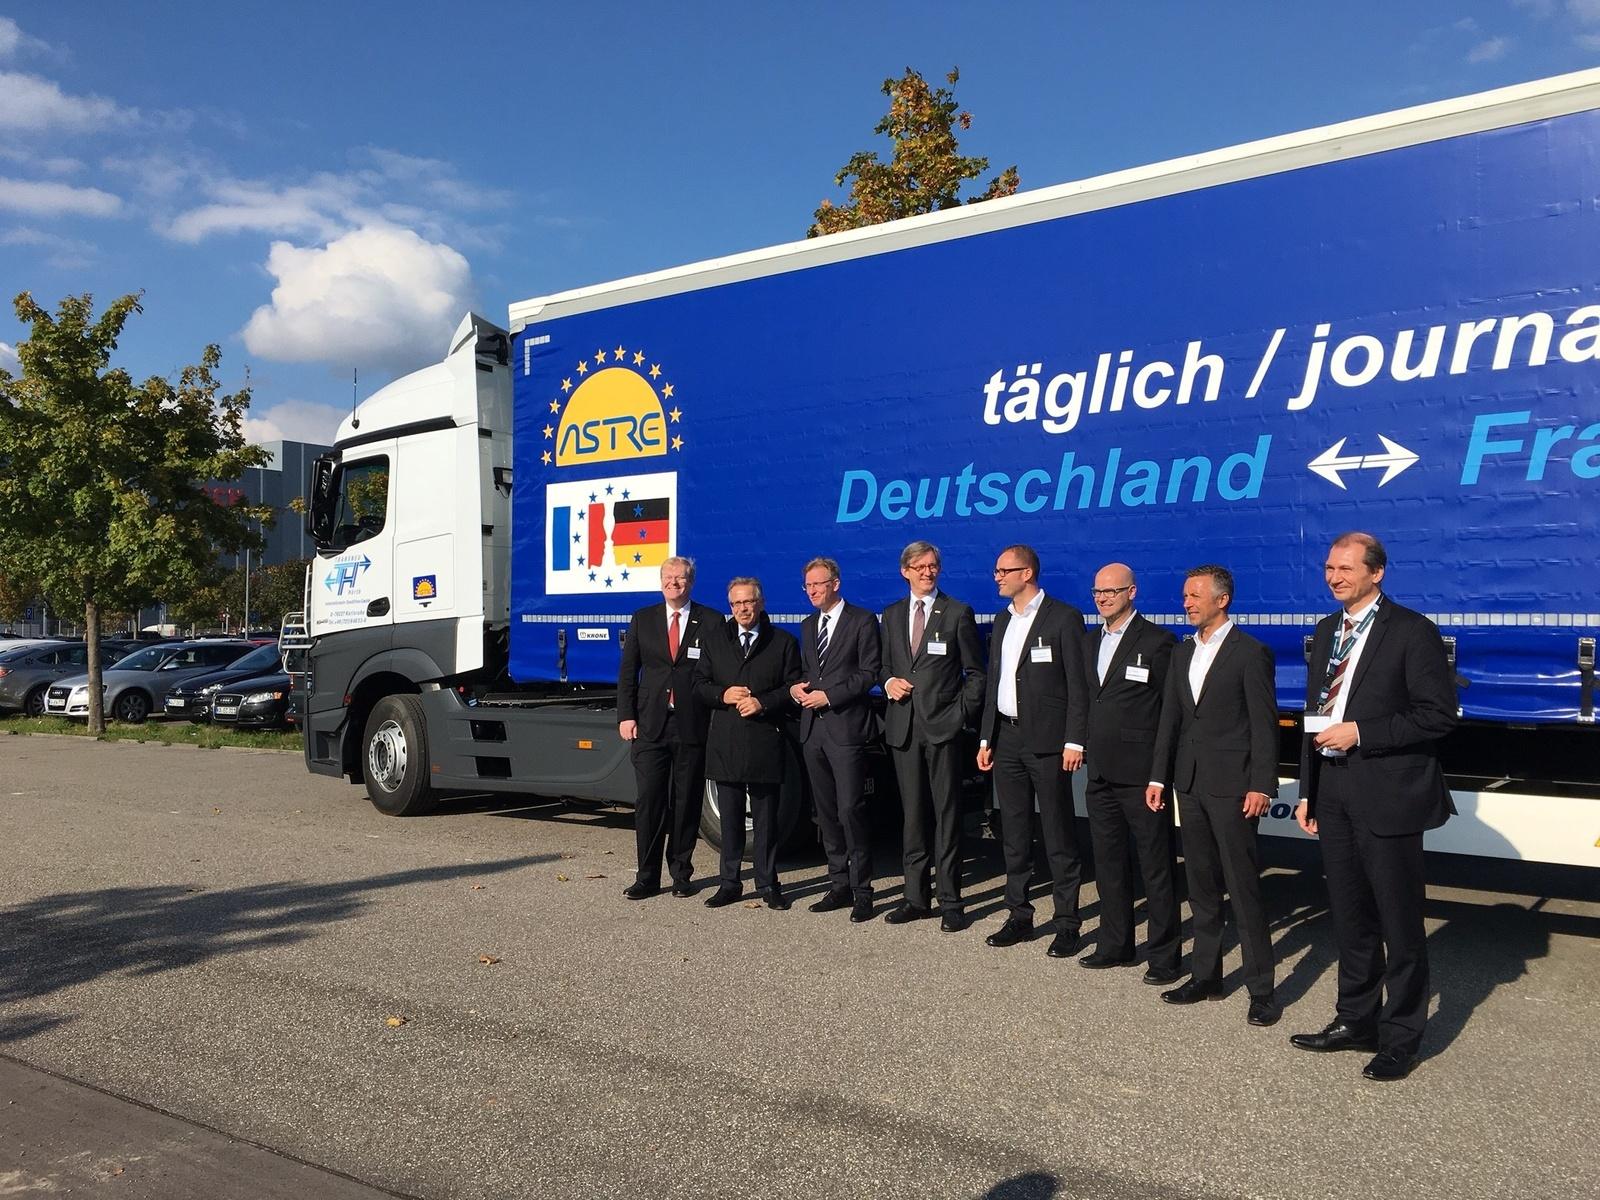 Bosch Secure Truck Parking live Demonstration in Karlsruhe, Germany